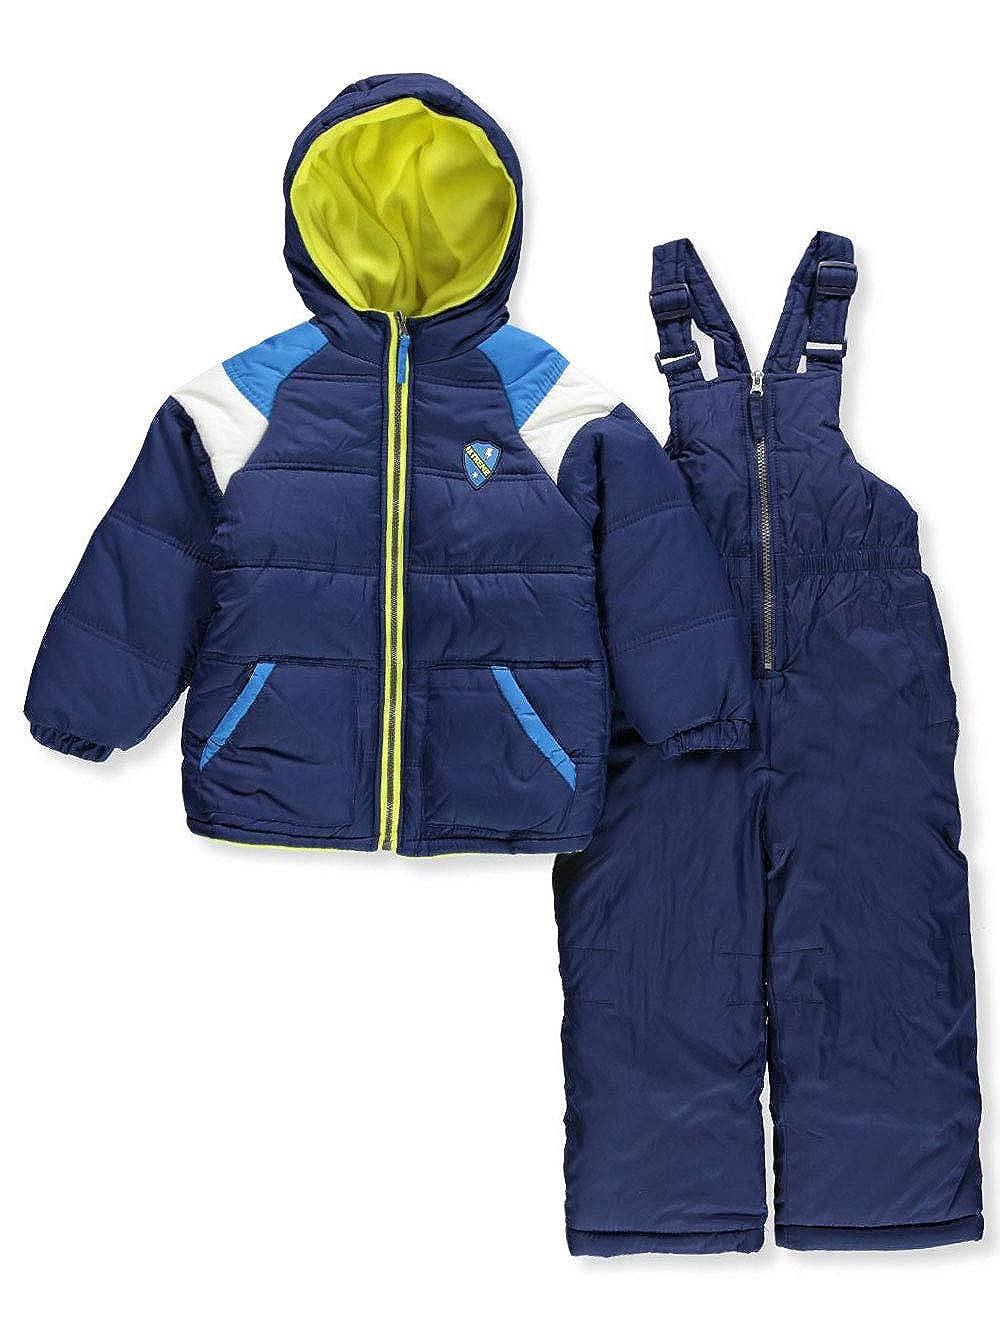 iXtreme Boys' Toddler Active Colorblock Snowsuit